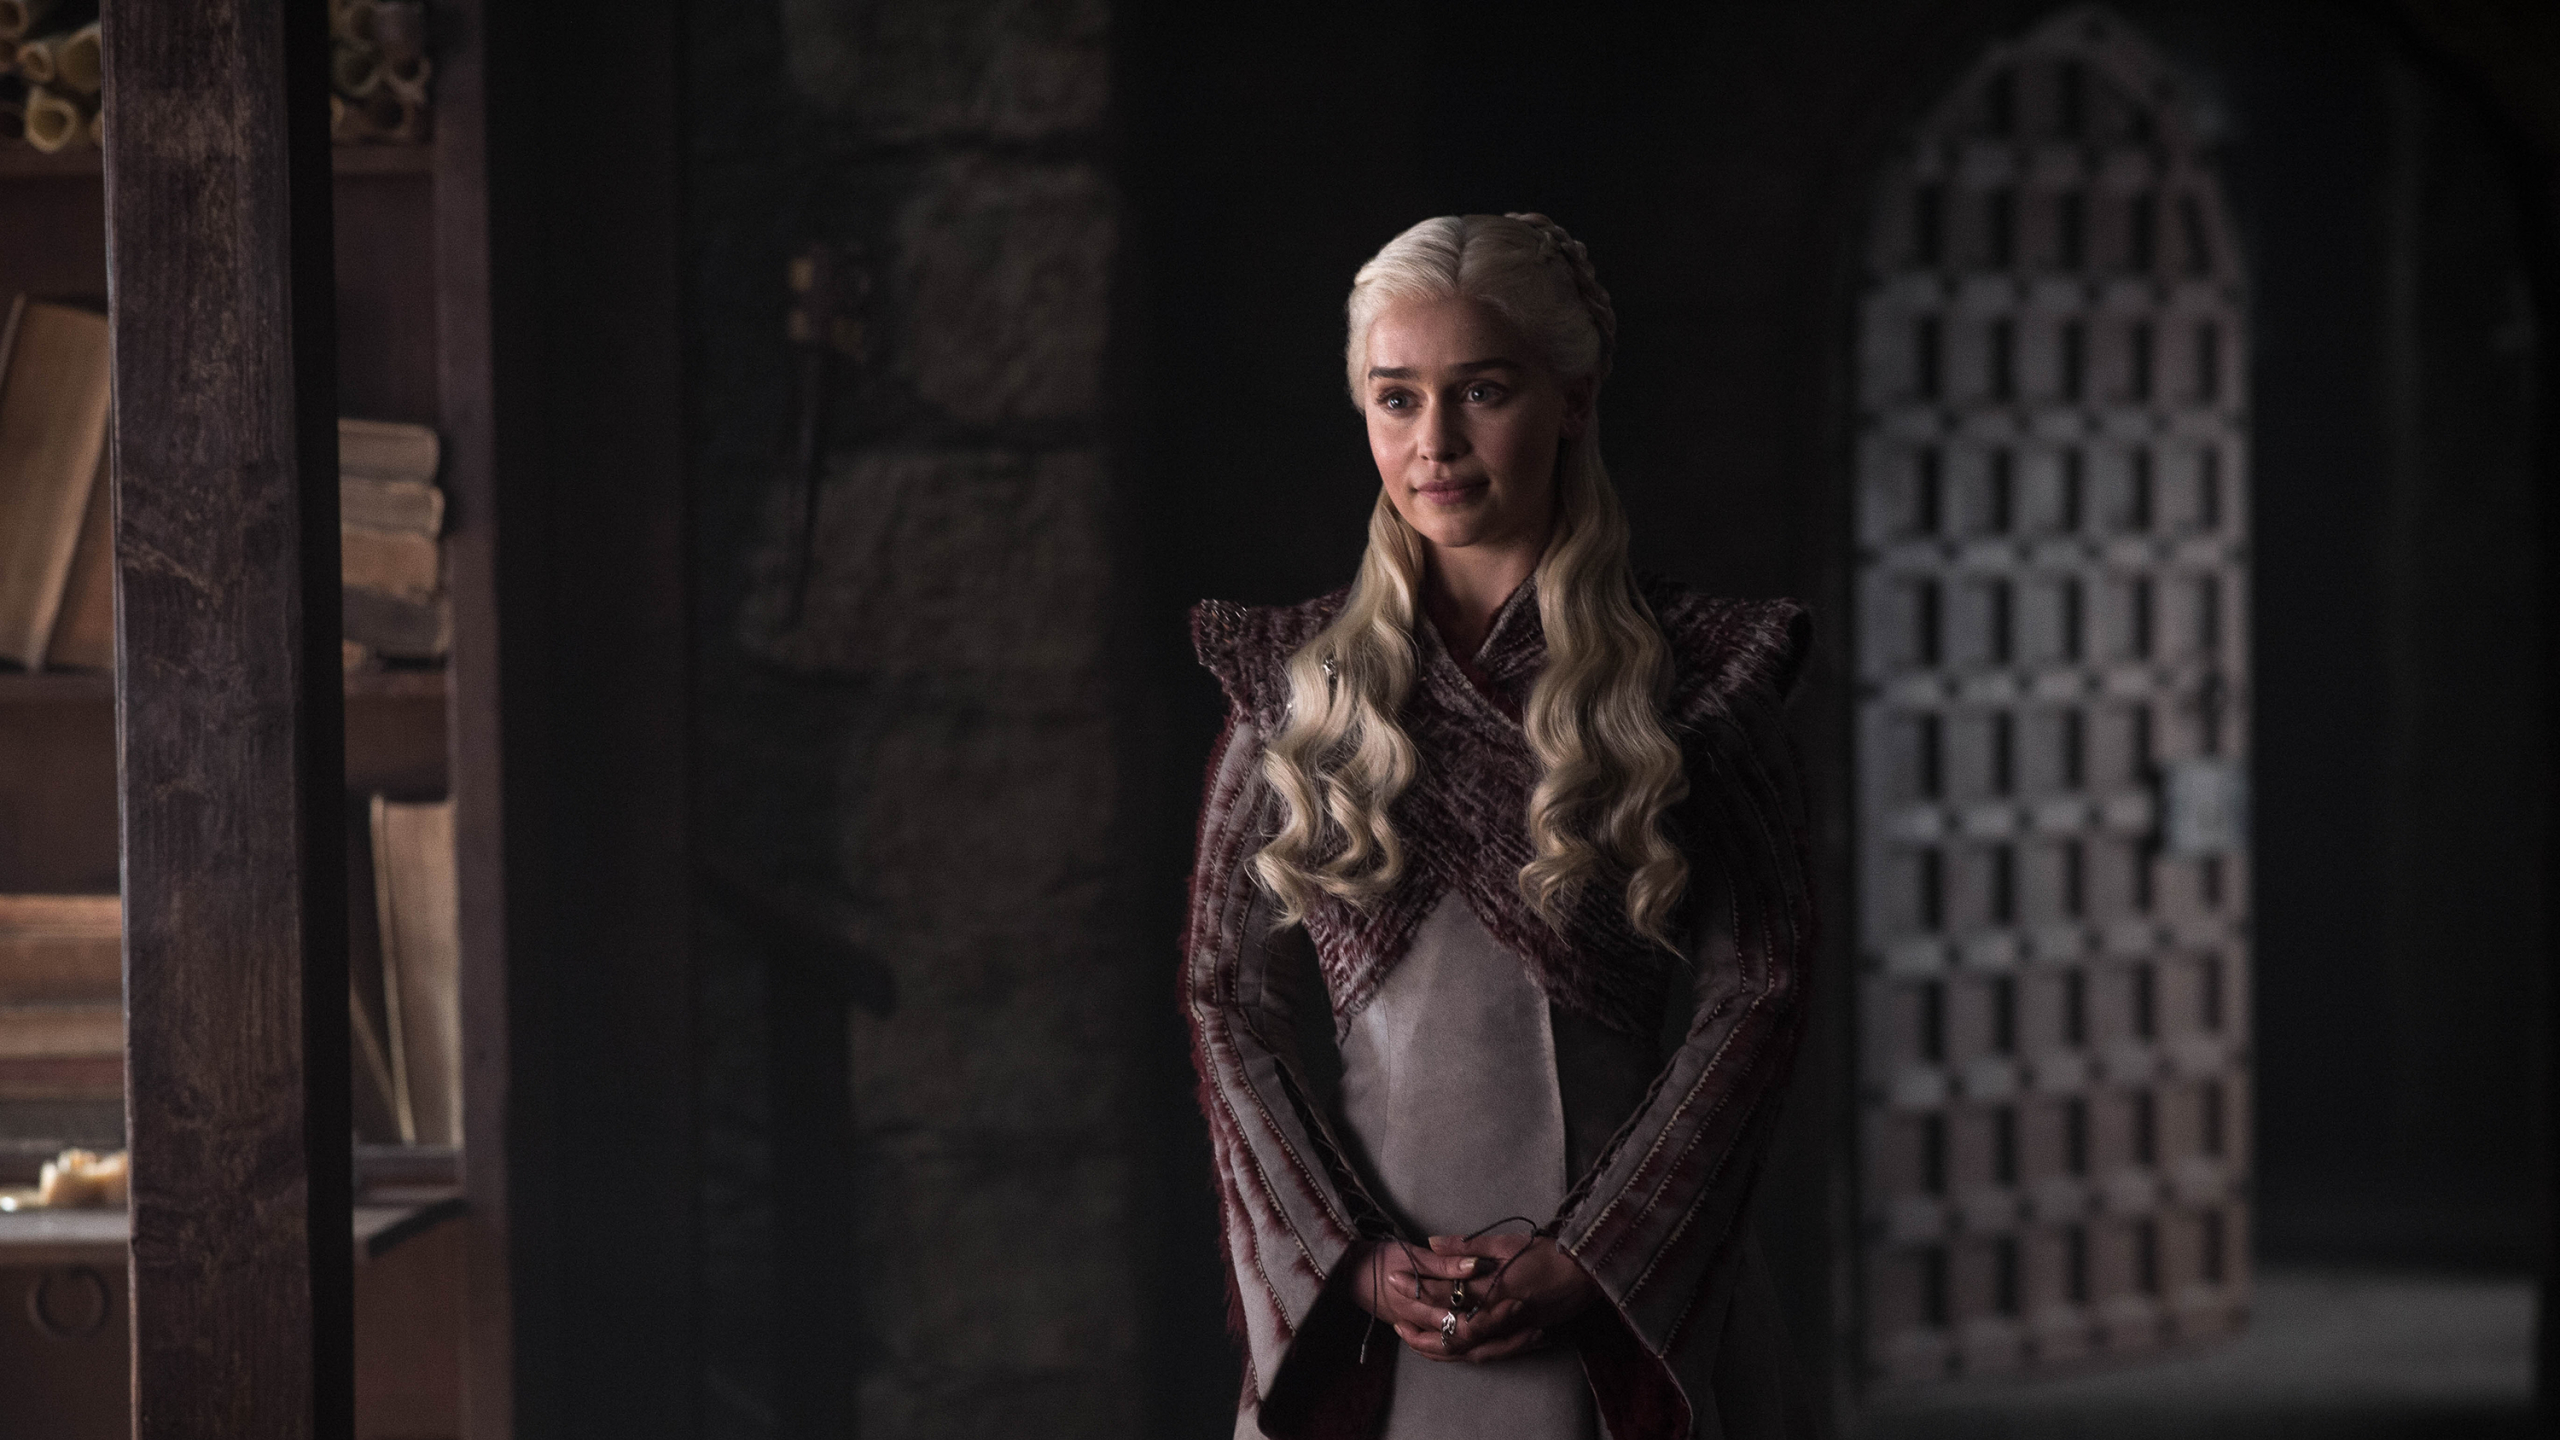 2560x1440 Emilia Clarke As Daenerys Targaryen In Got 8 1440p